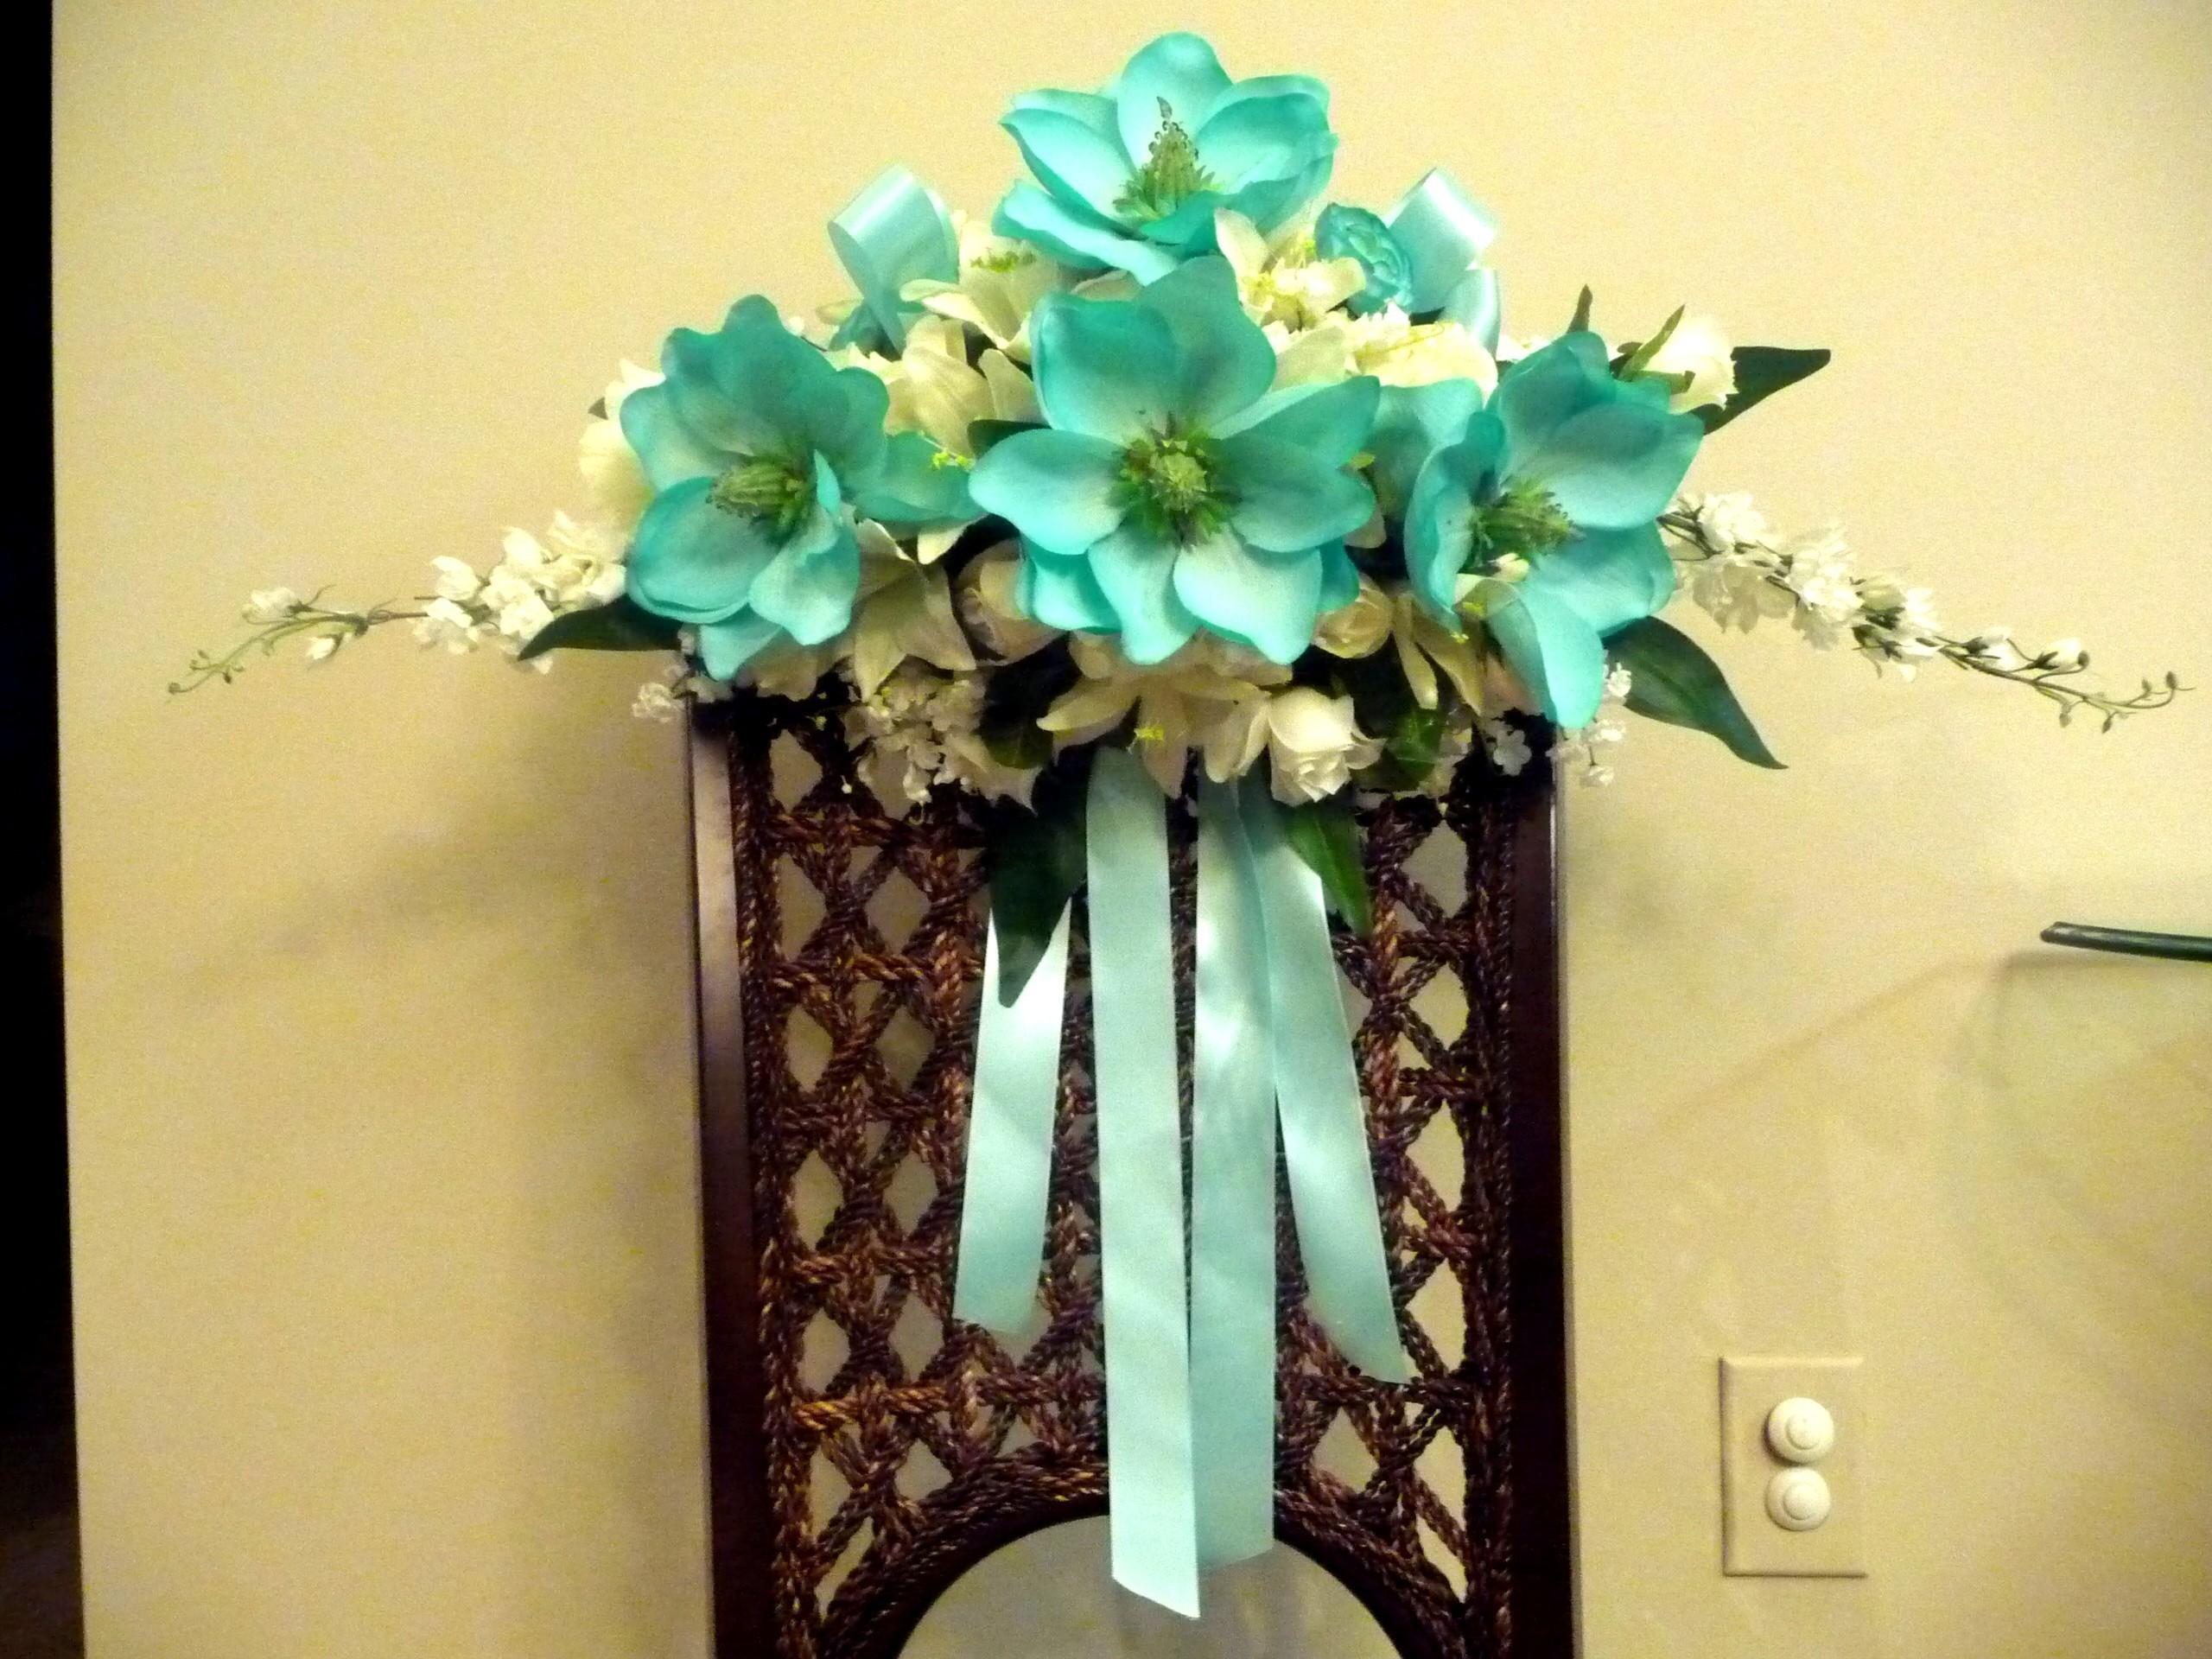 Ceremony, Inspiration, Reception, Flowers & Decor, white, blue, Ceremony Flowers, Flowers, Floral, Hand, Board, Decorative, Spray, Painted, Savannah event decor, Magnolias